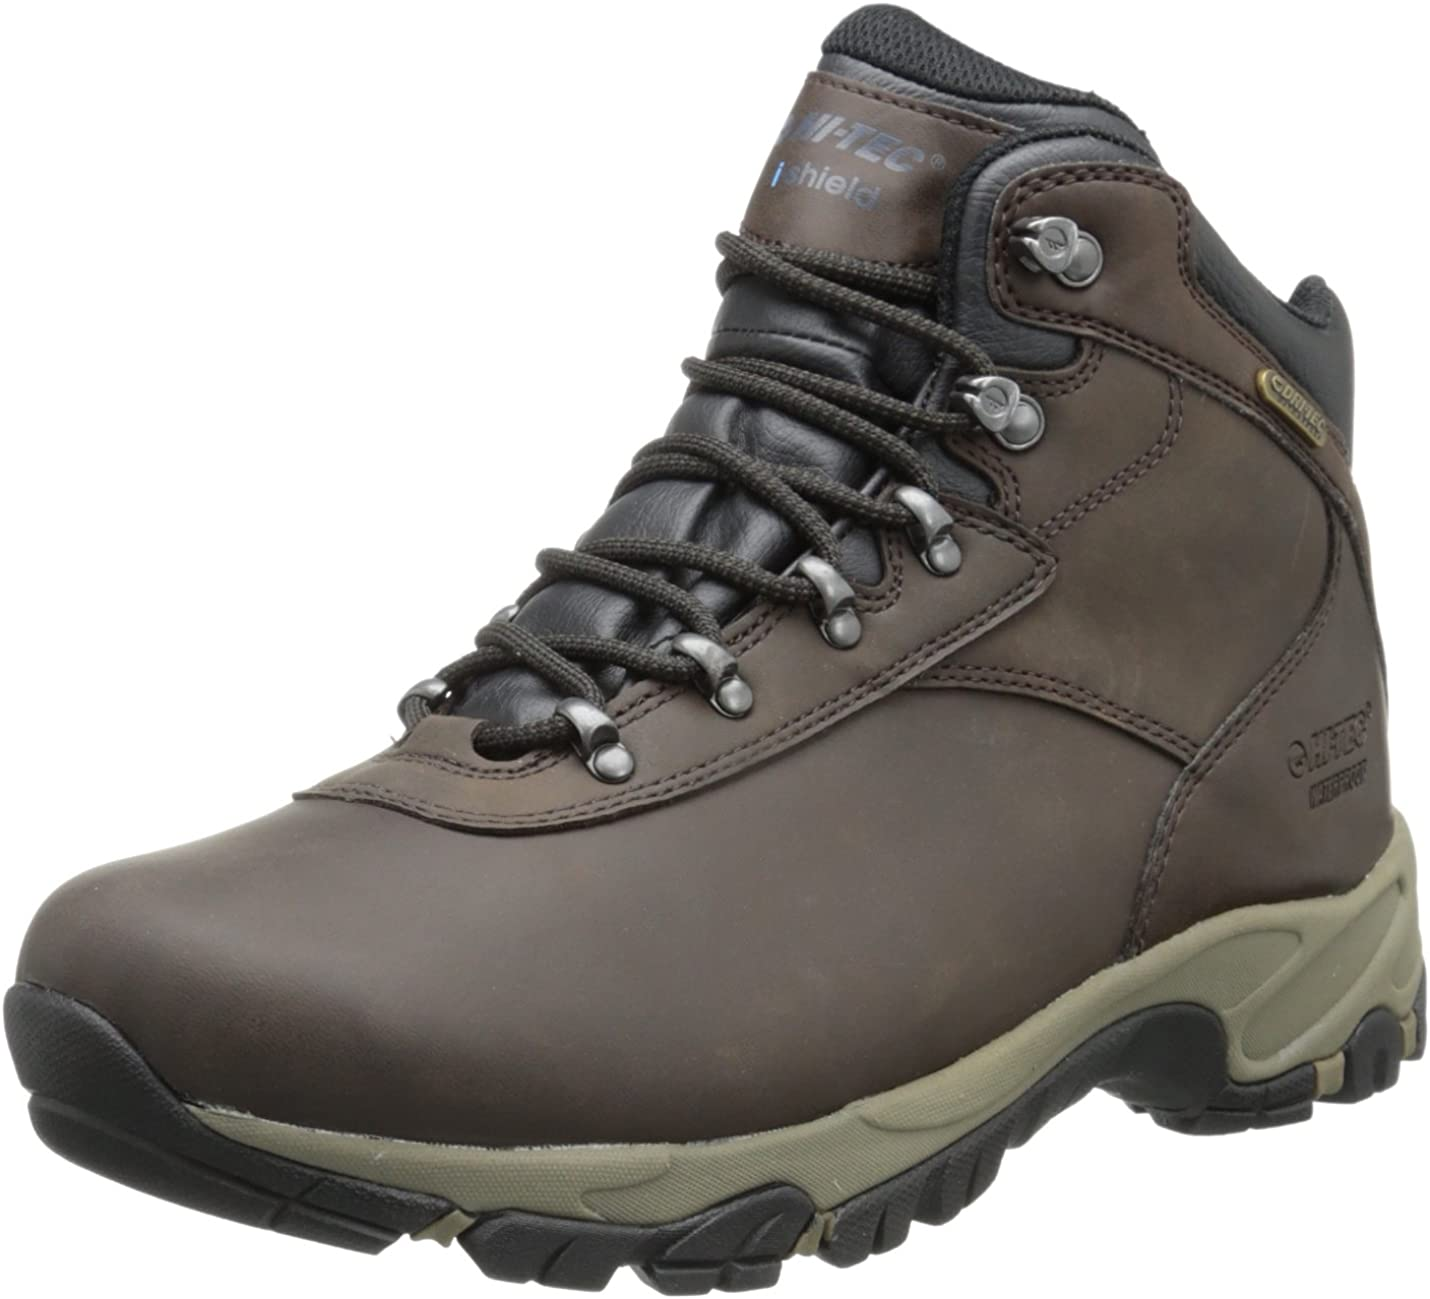 Hi-Tec Men's Altitude V I Waterproof Wide Hiking Boot,Dark Chocolate/Light Taupe/Black,10 W US